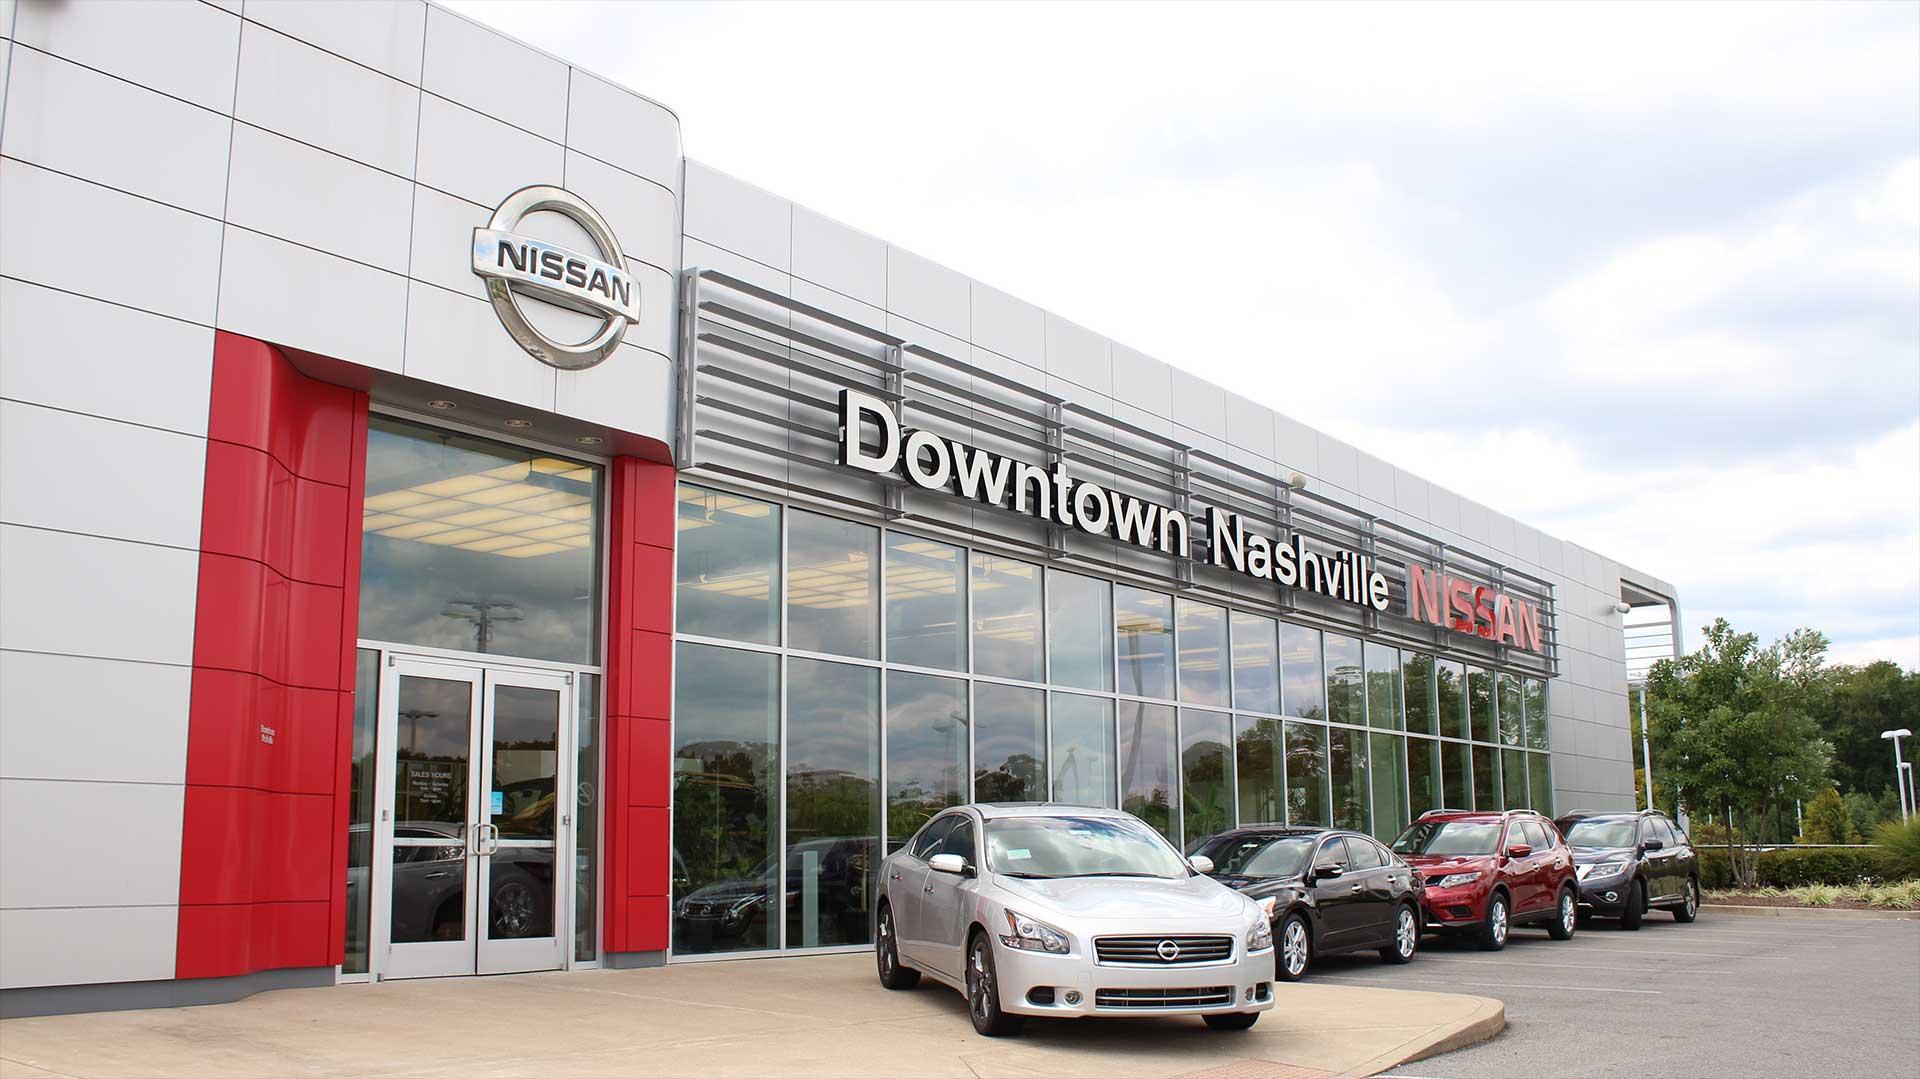 Car Lots In Nashville Tn >> Downtown Nashville Nissan New Used Nissan Dealership